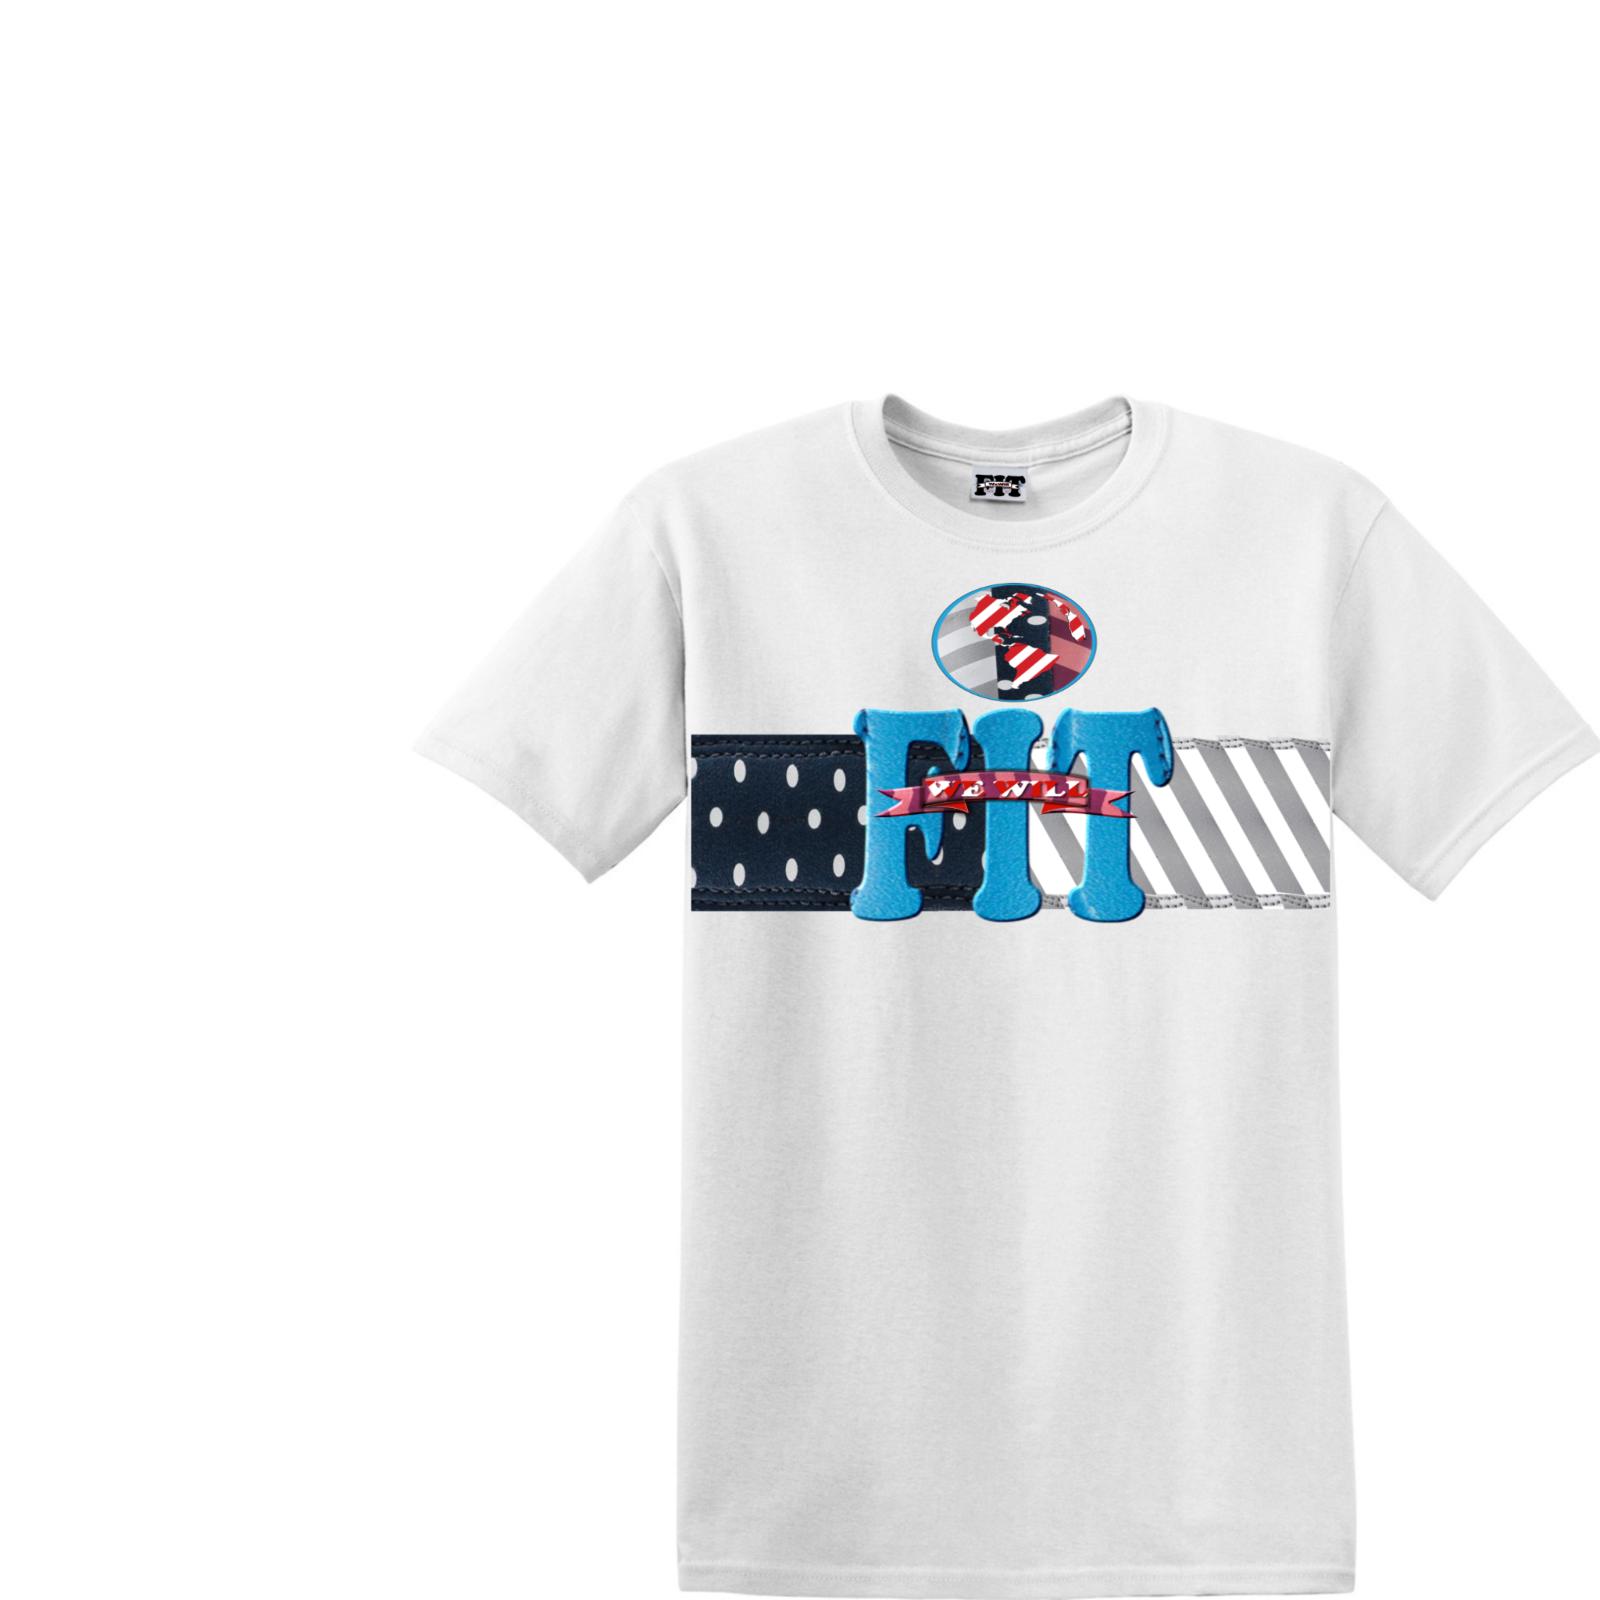 magasin en ligne 816fc 7c88f Футболки We Will Fit shirt match Nike air max 1 Parra Pure ...